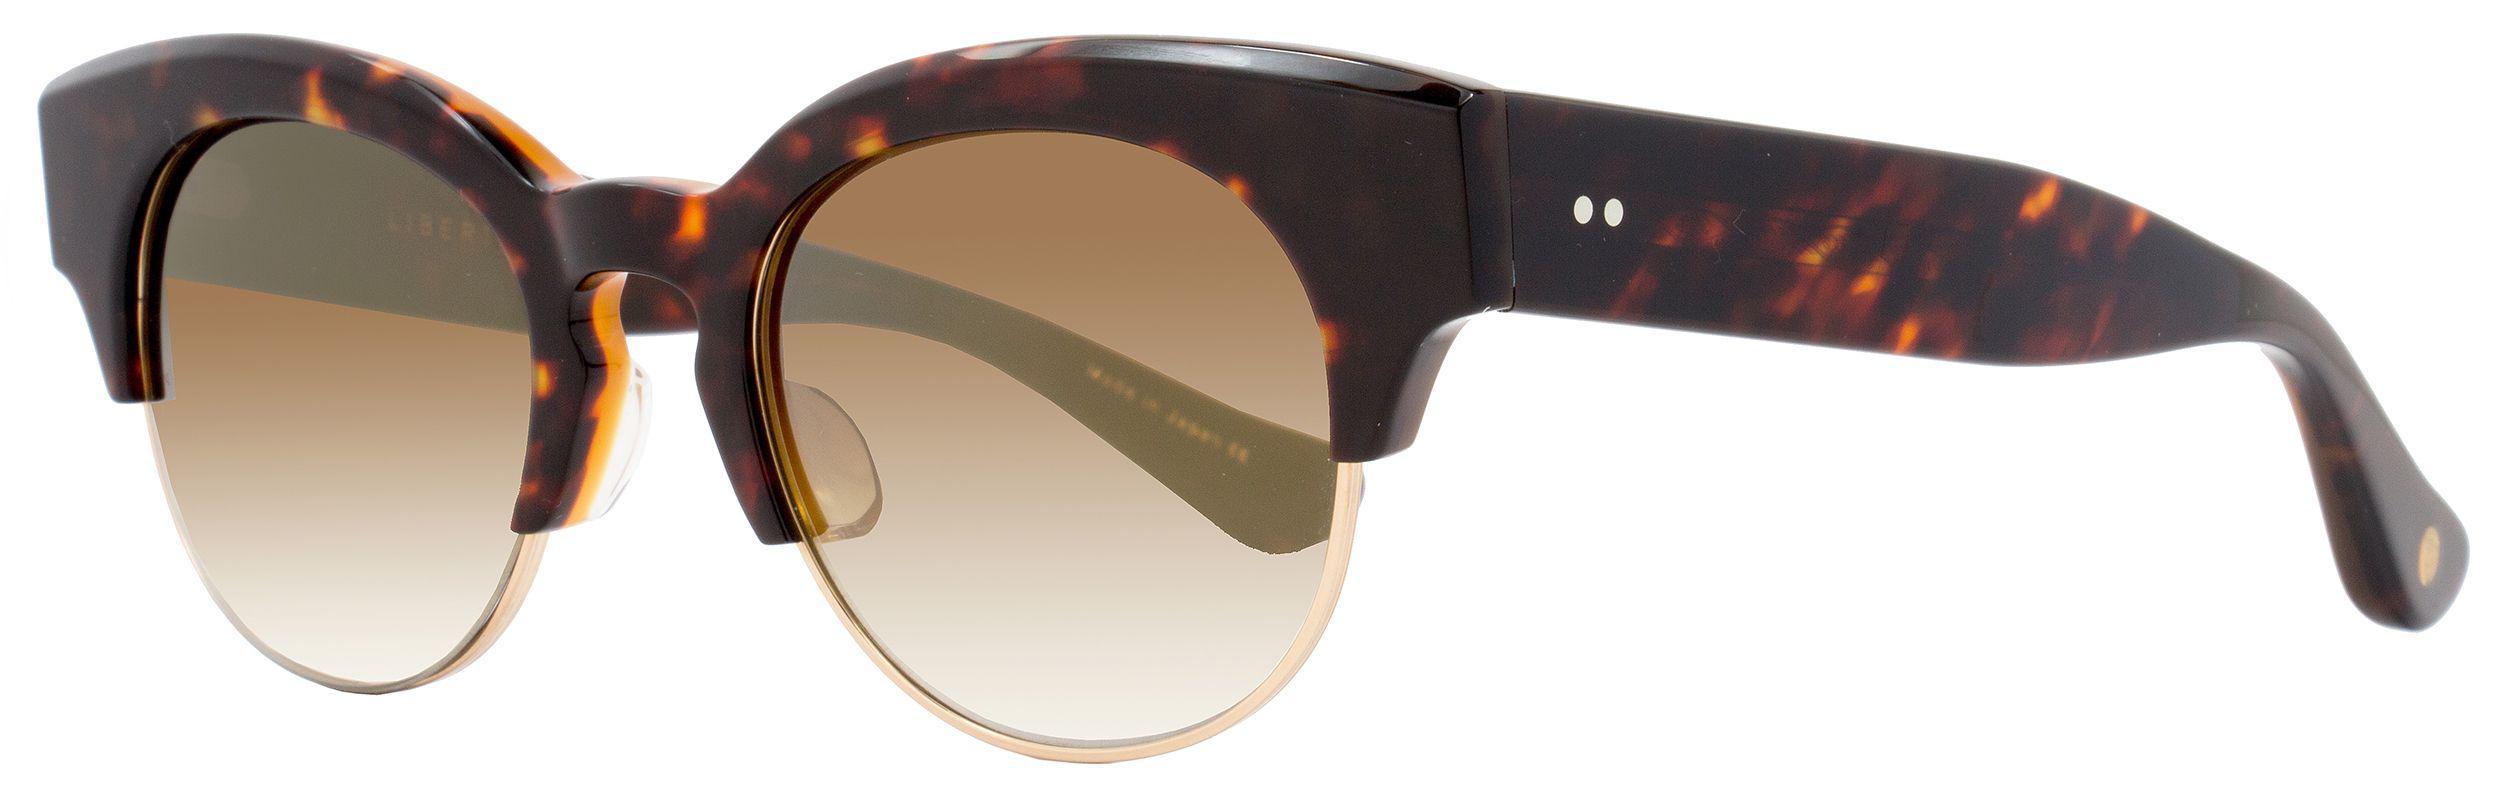 29cd765422a Lyst - Dita Oval Sunglasses 22026 Liberty B-trt-gld Tortoise gold 22026